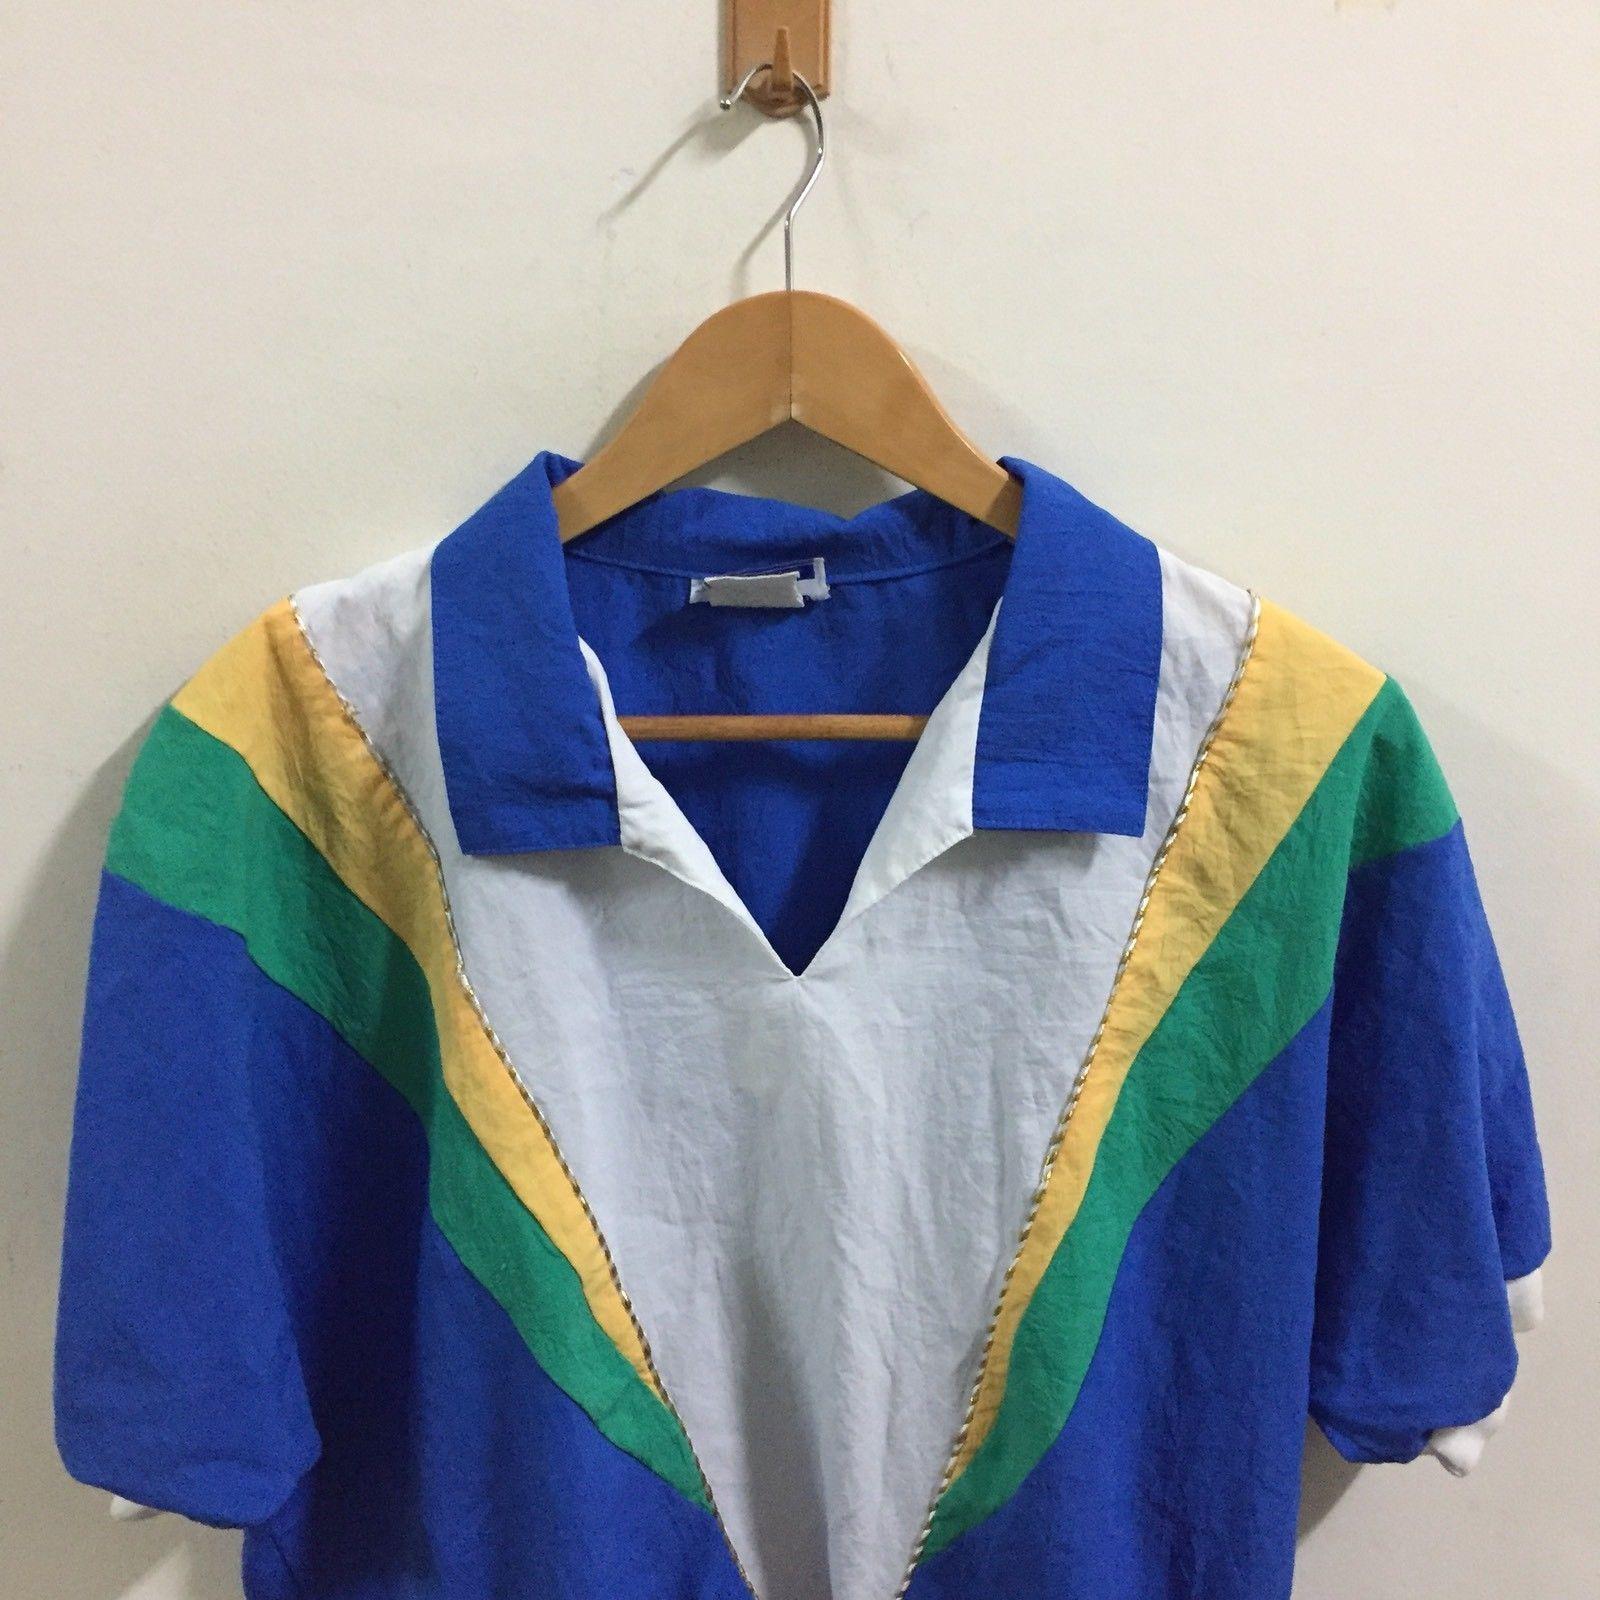 VTG 90's Gape God Tops T-Shirt SZ L ColorBlock  Rare Made In USA image 4